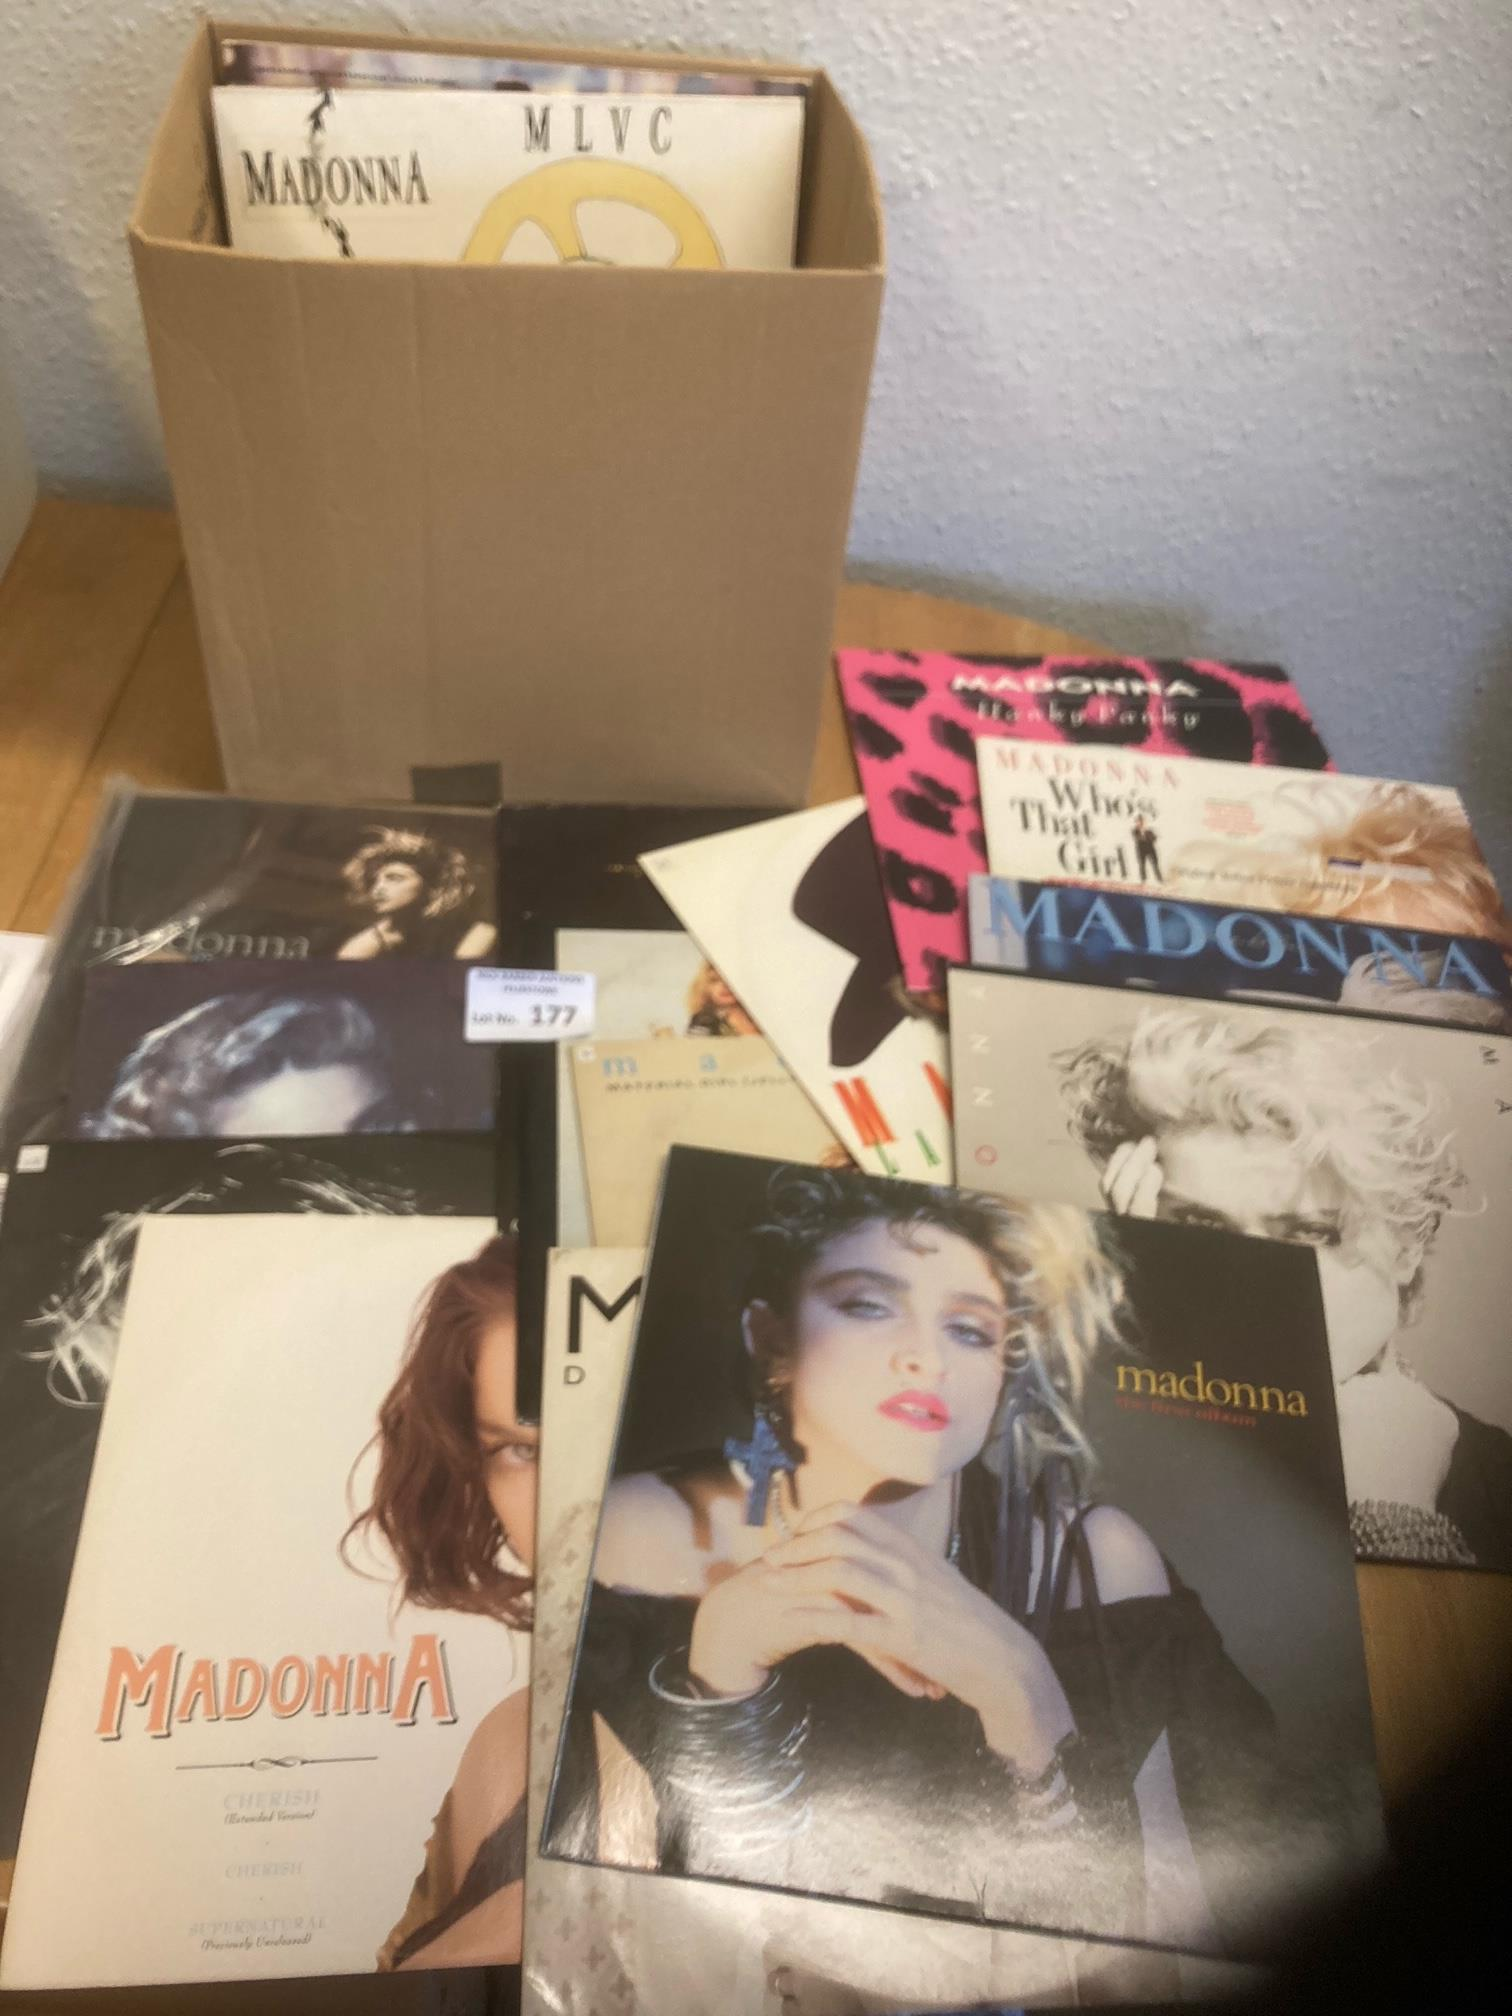 "Records : MADONNA 24 12"" singles & album selection"